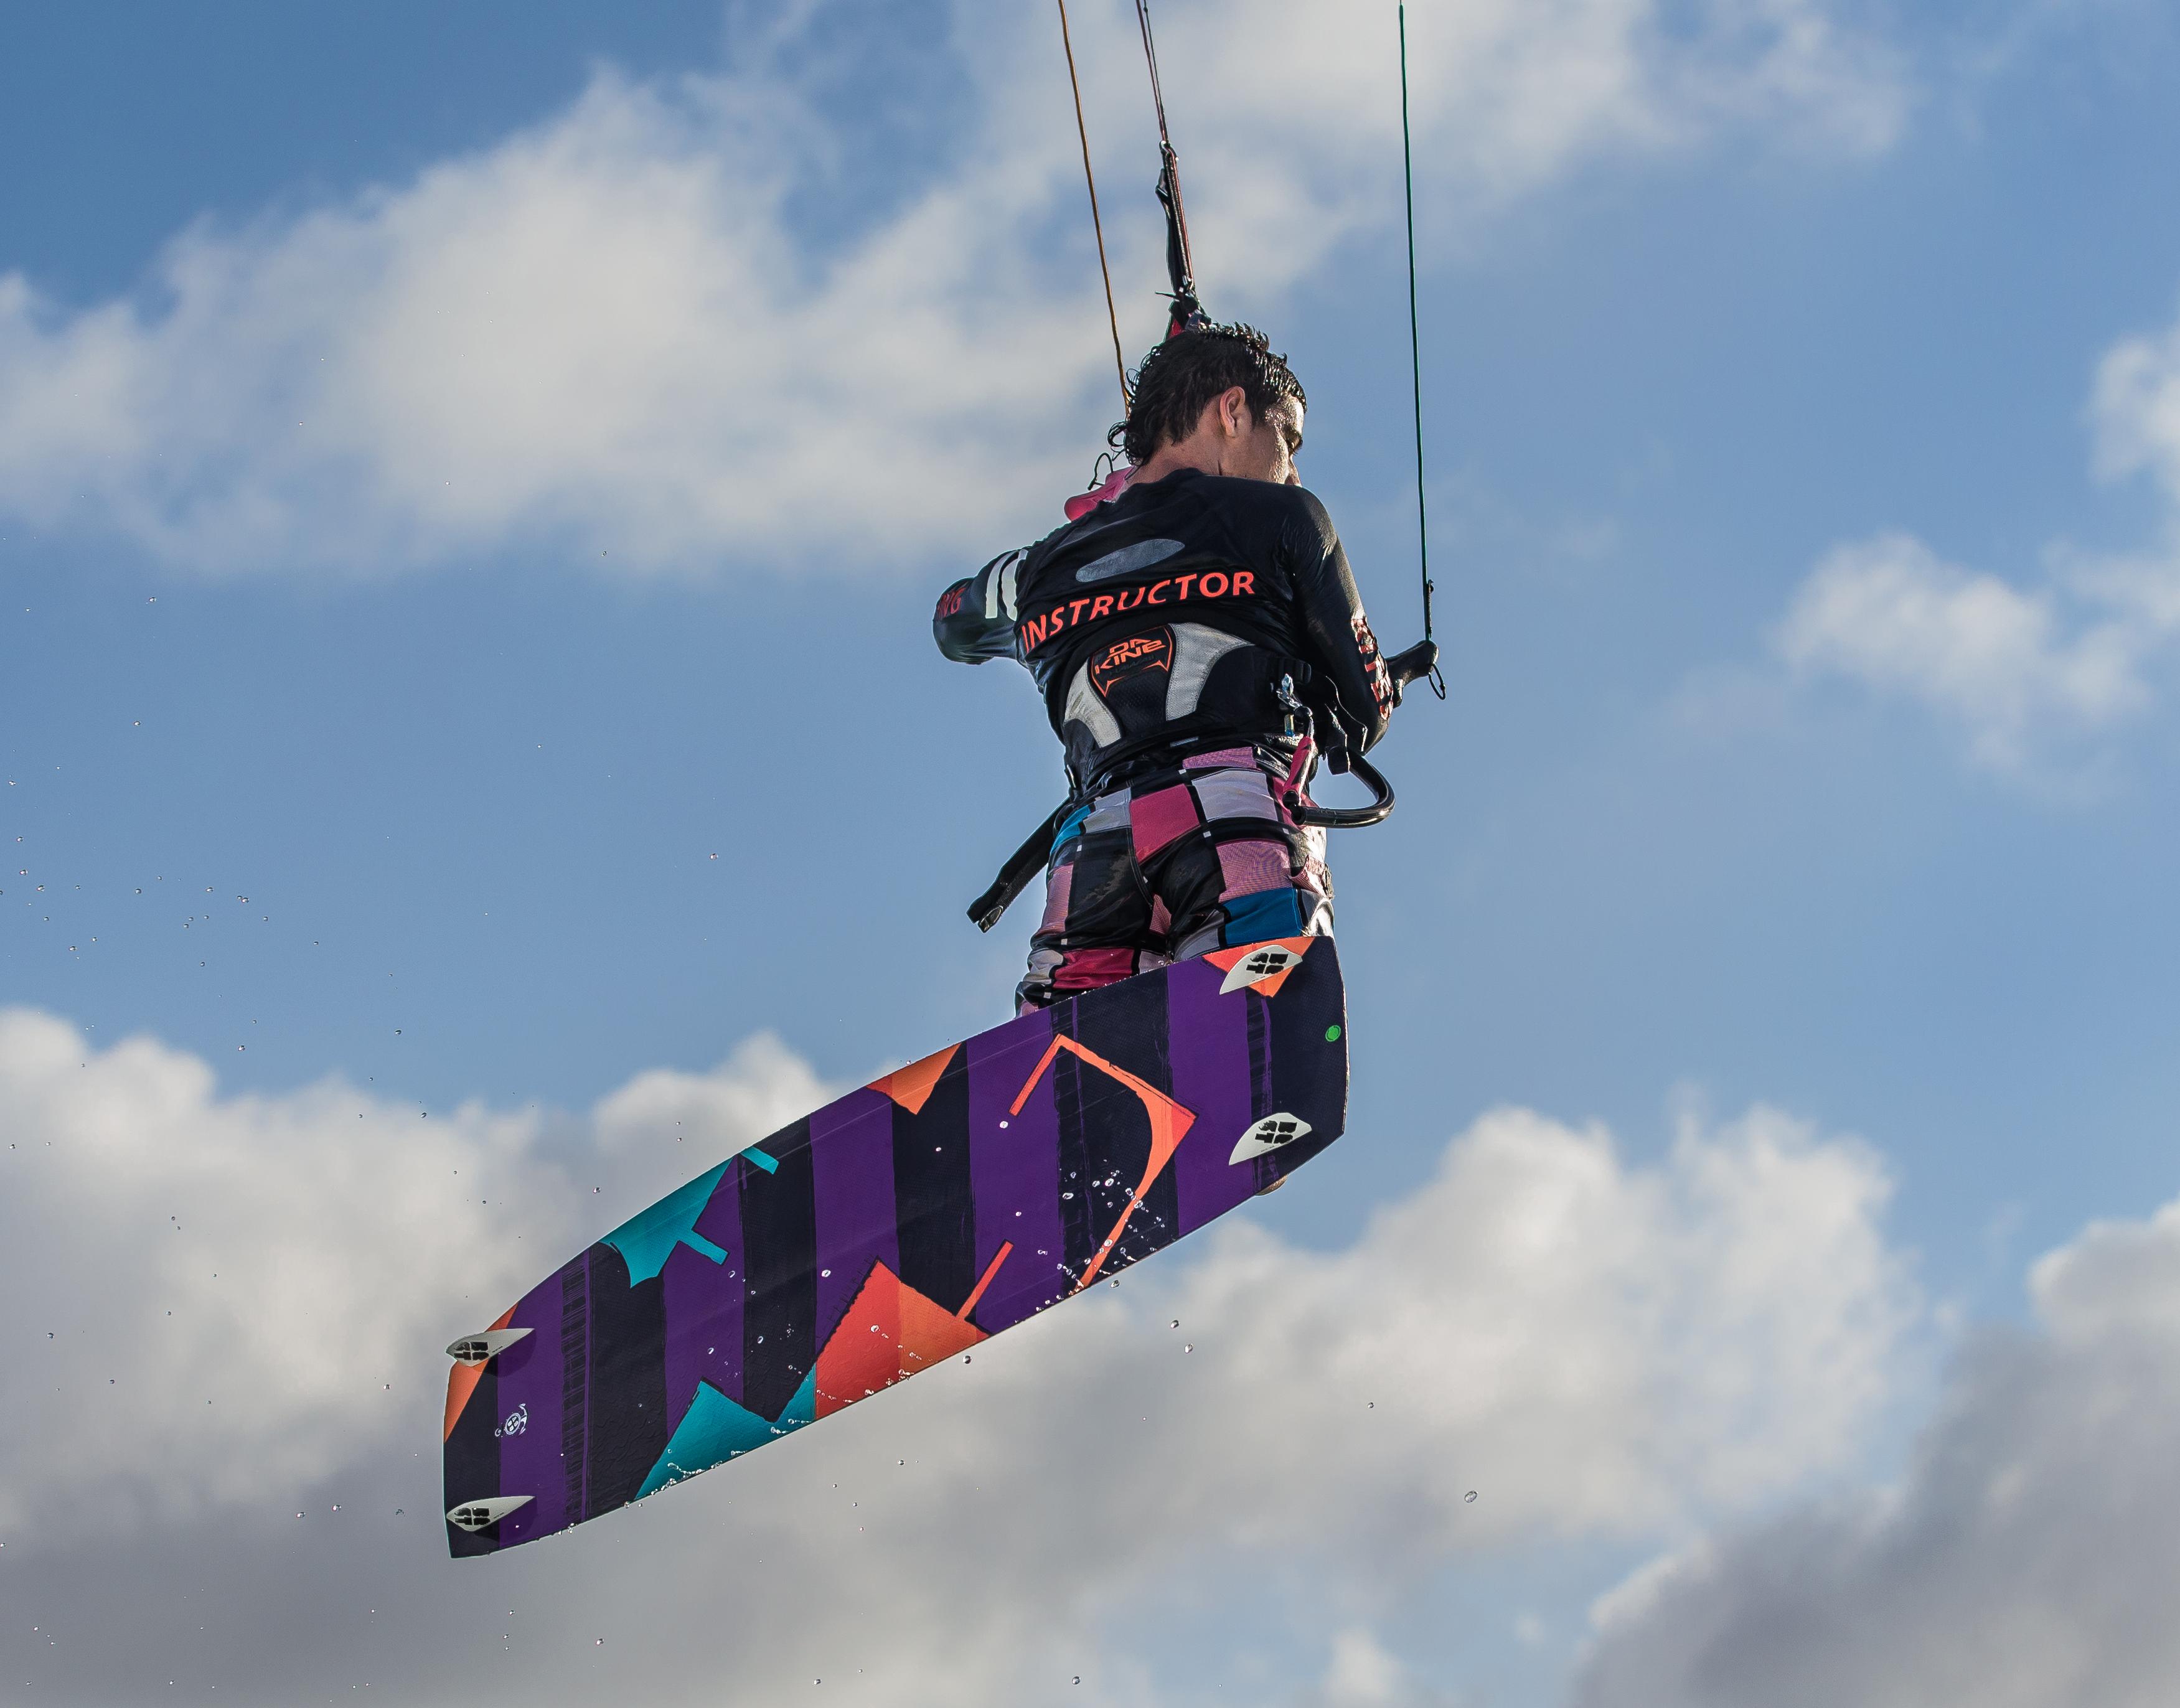 A73Q2884-1.jpg Kitesurfing Pictures